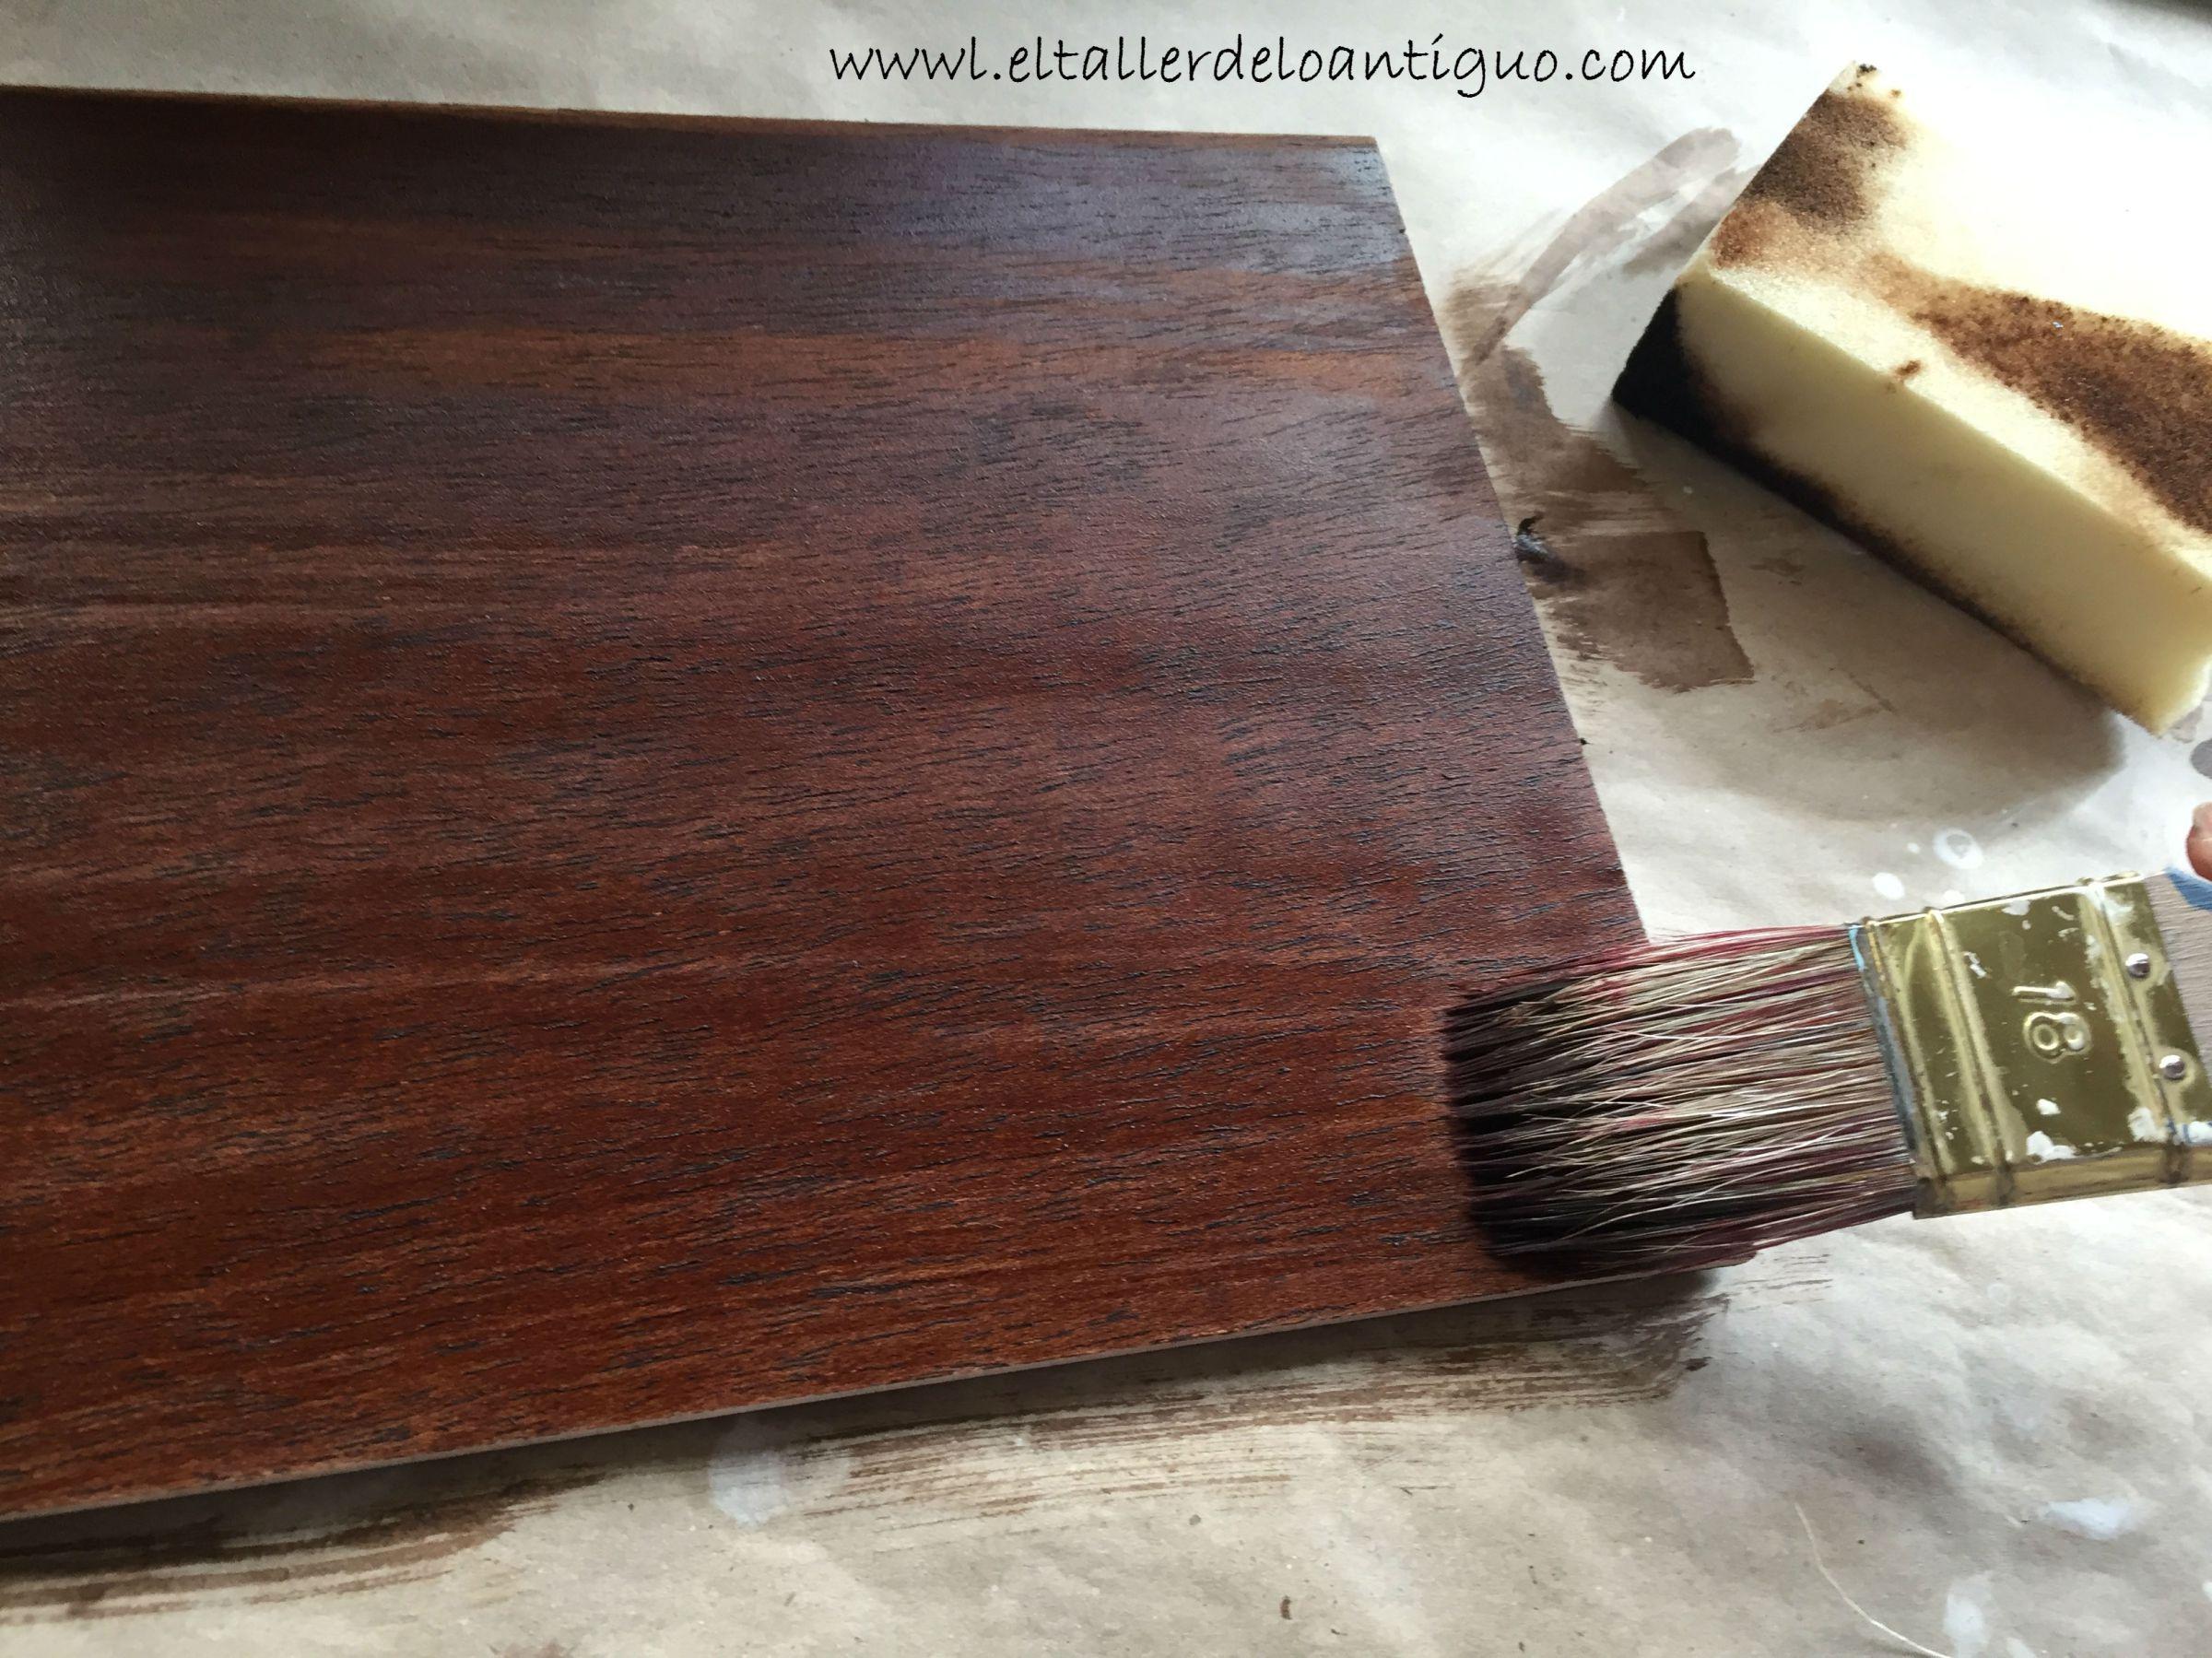 8 Como Hacer Tinte Nogal Para Muebles Tinte Madera Tintas Para Madera Teñir Madera